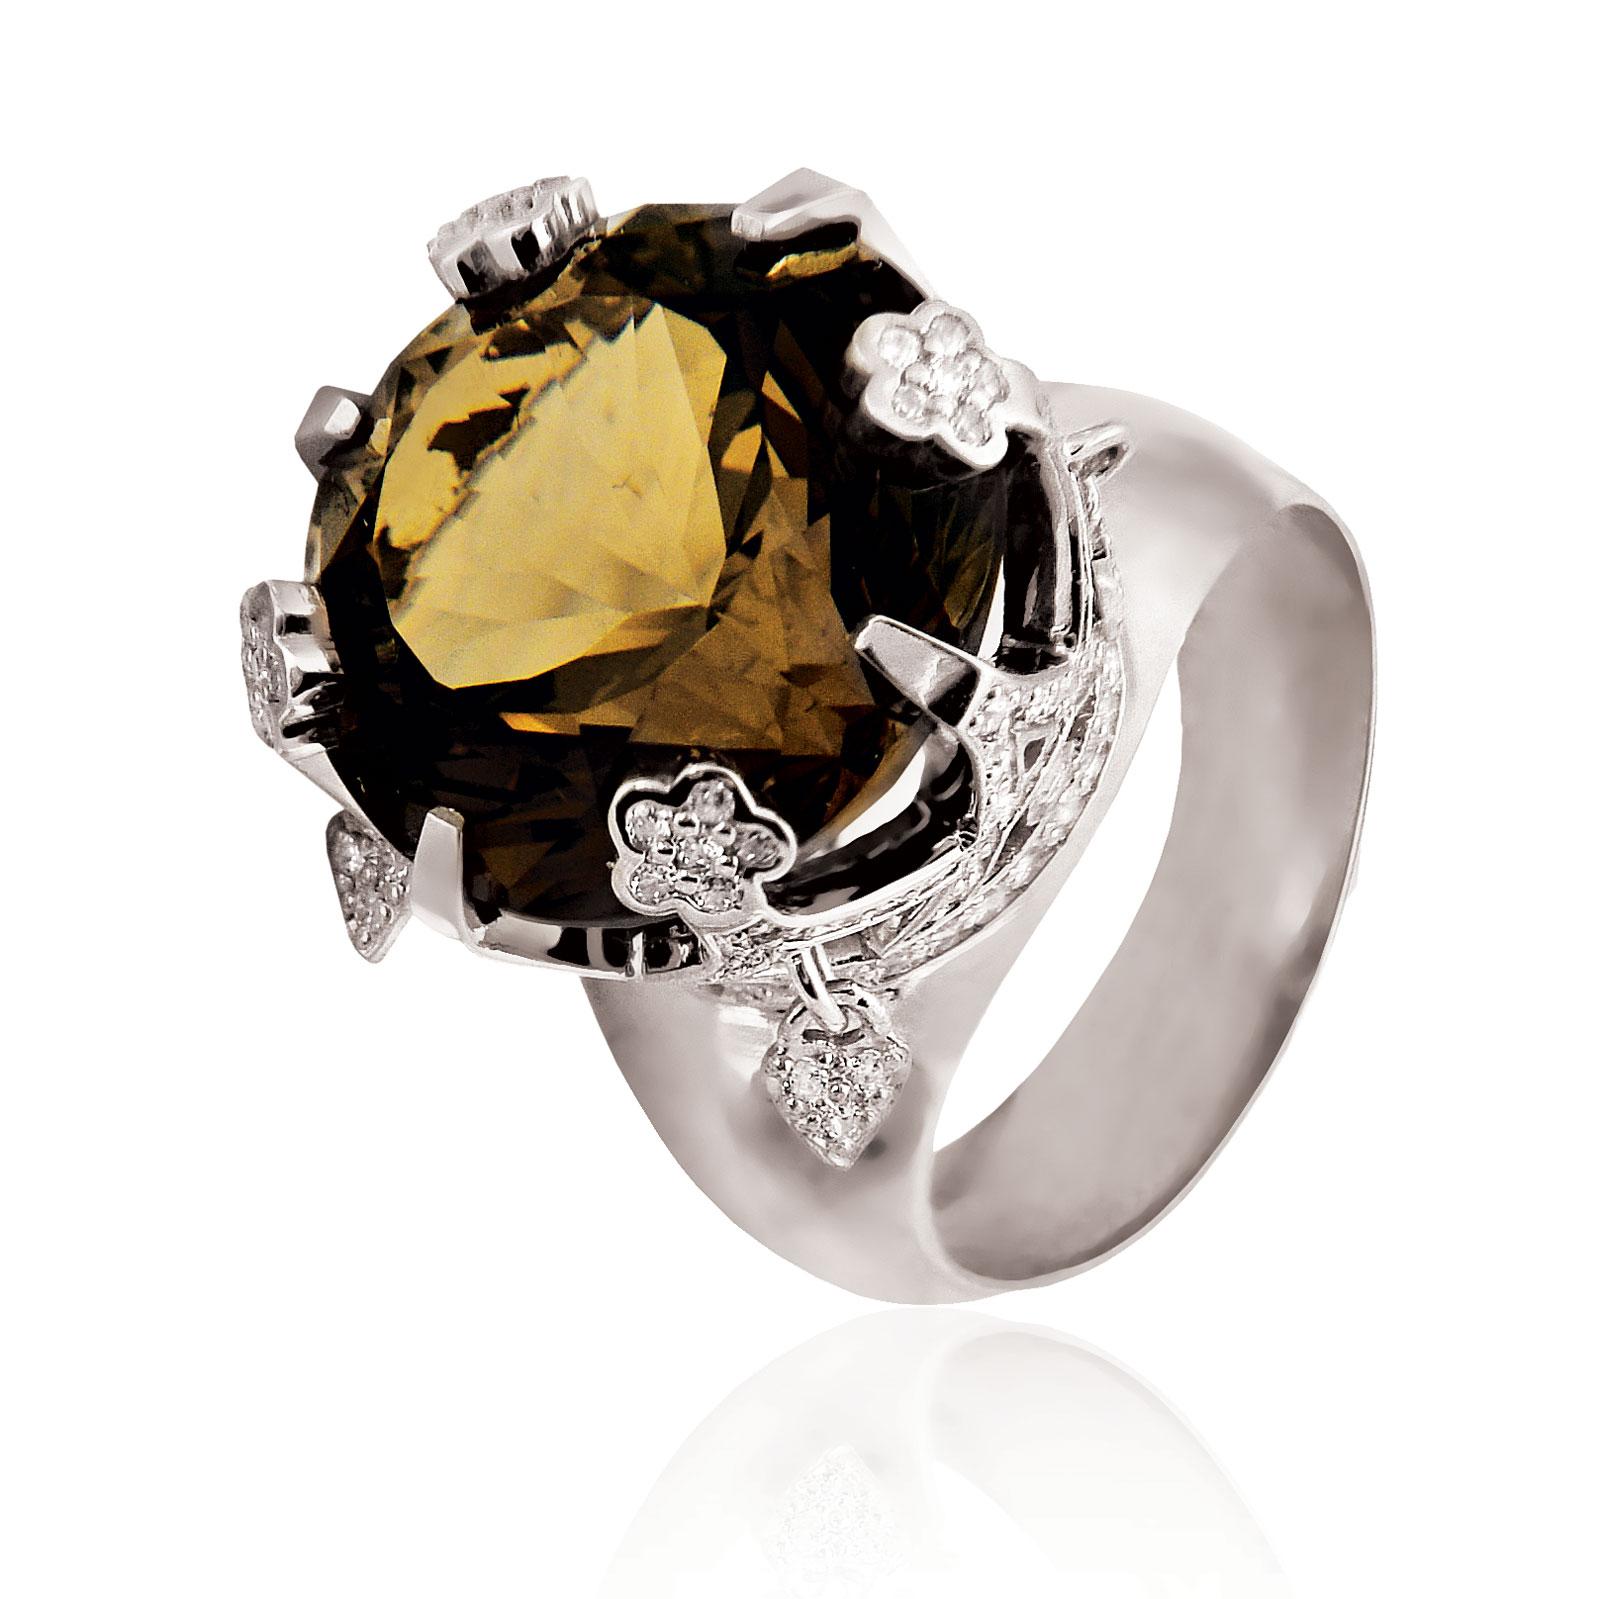 Золоте кільце з раухтопазом «Імператорська корона»